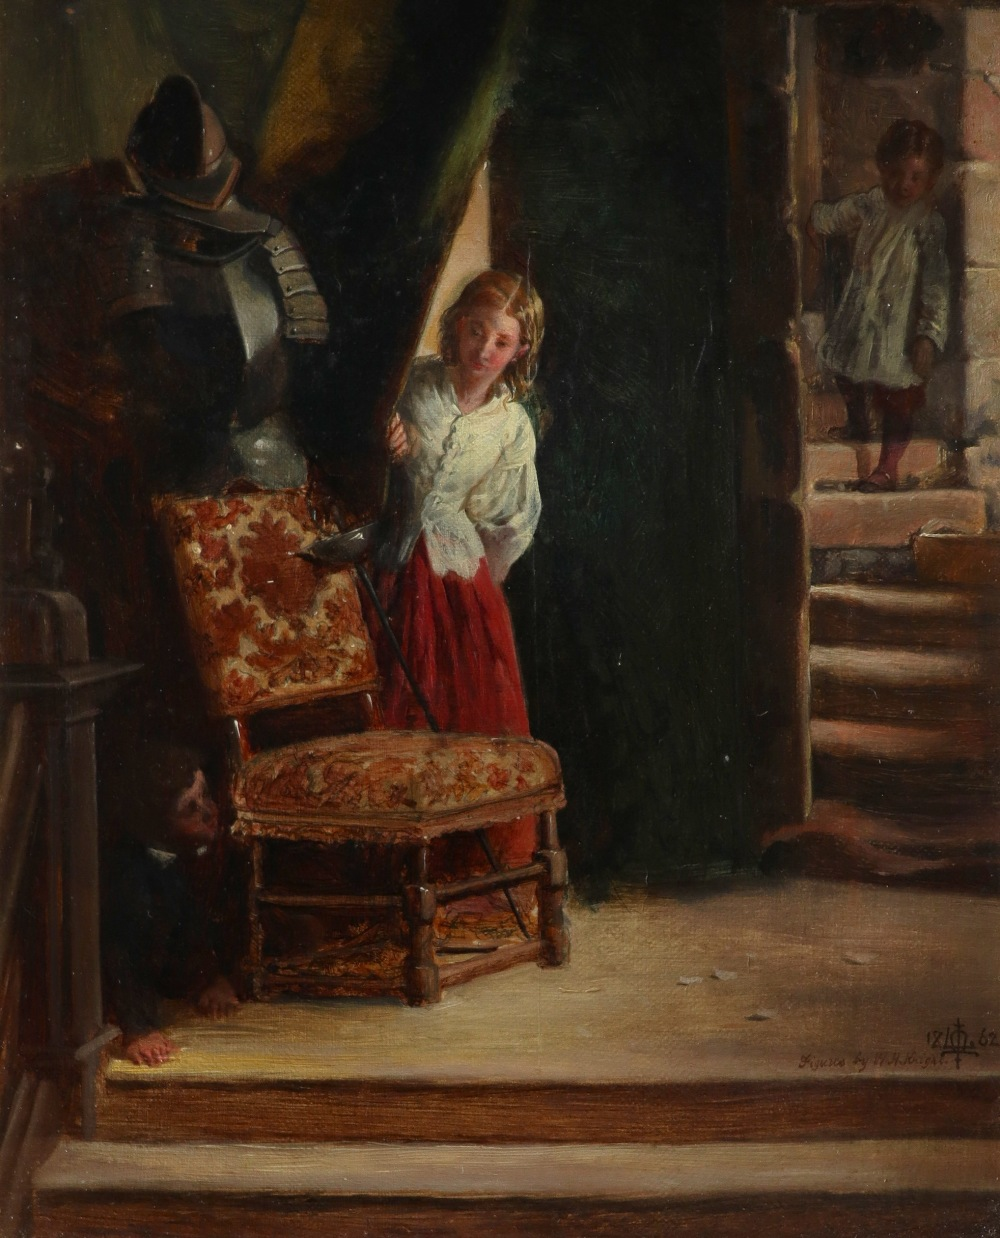 Matthew James Lawless (1837-1864) and William Henry Knight (1823-1863) Bo-Peep - Children playing